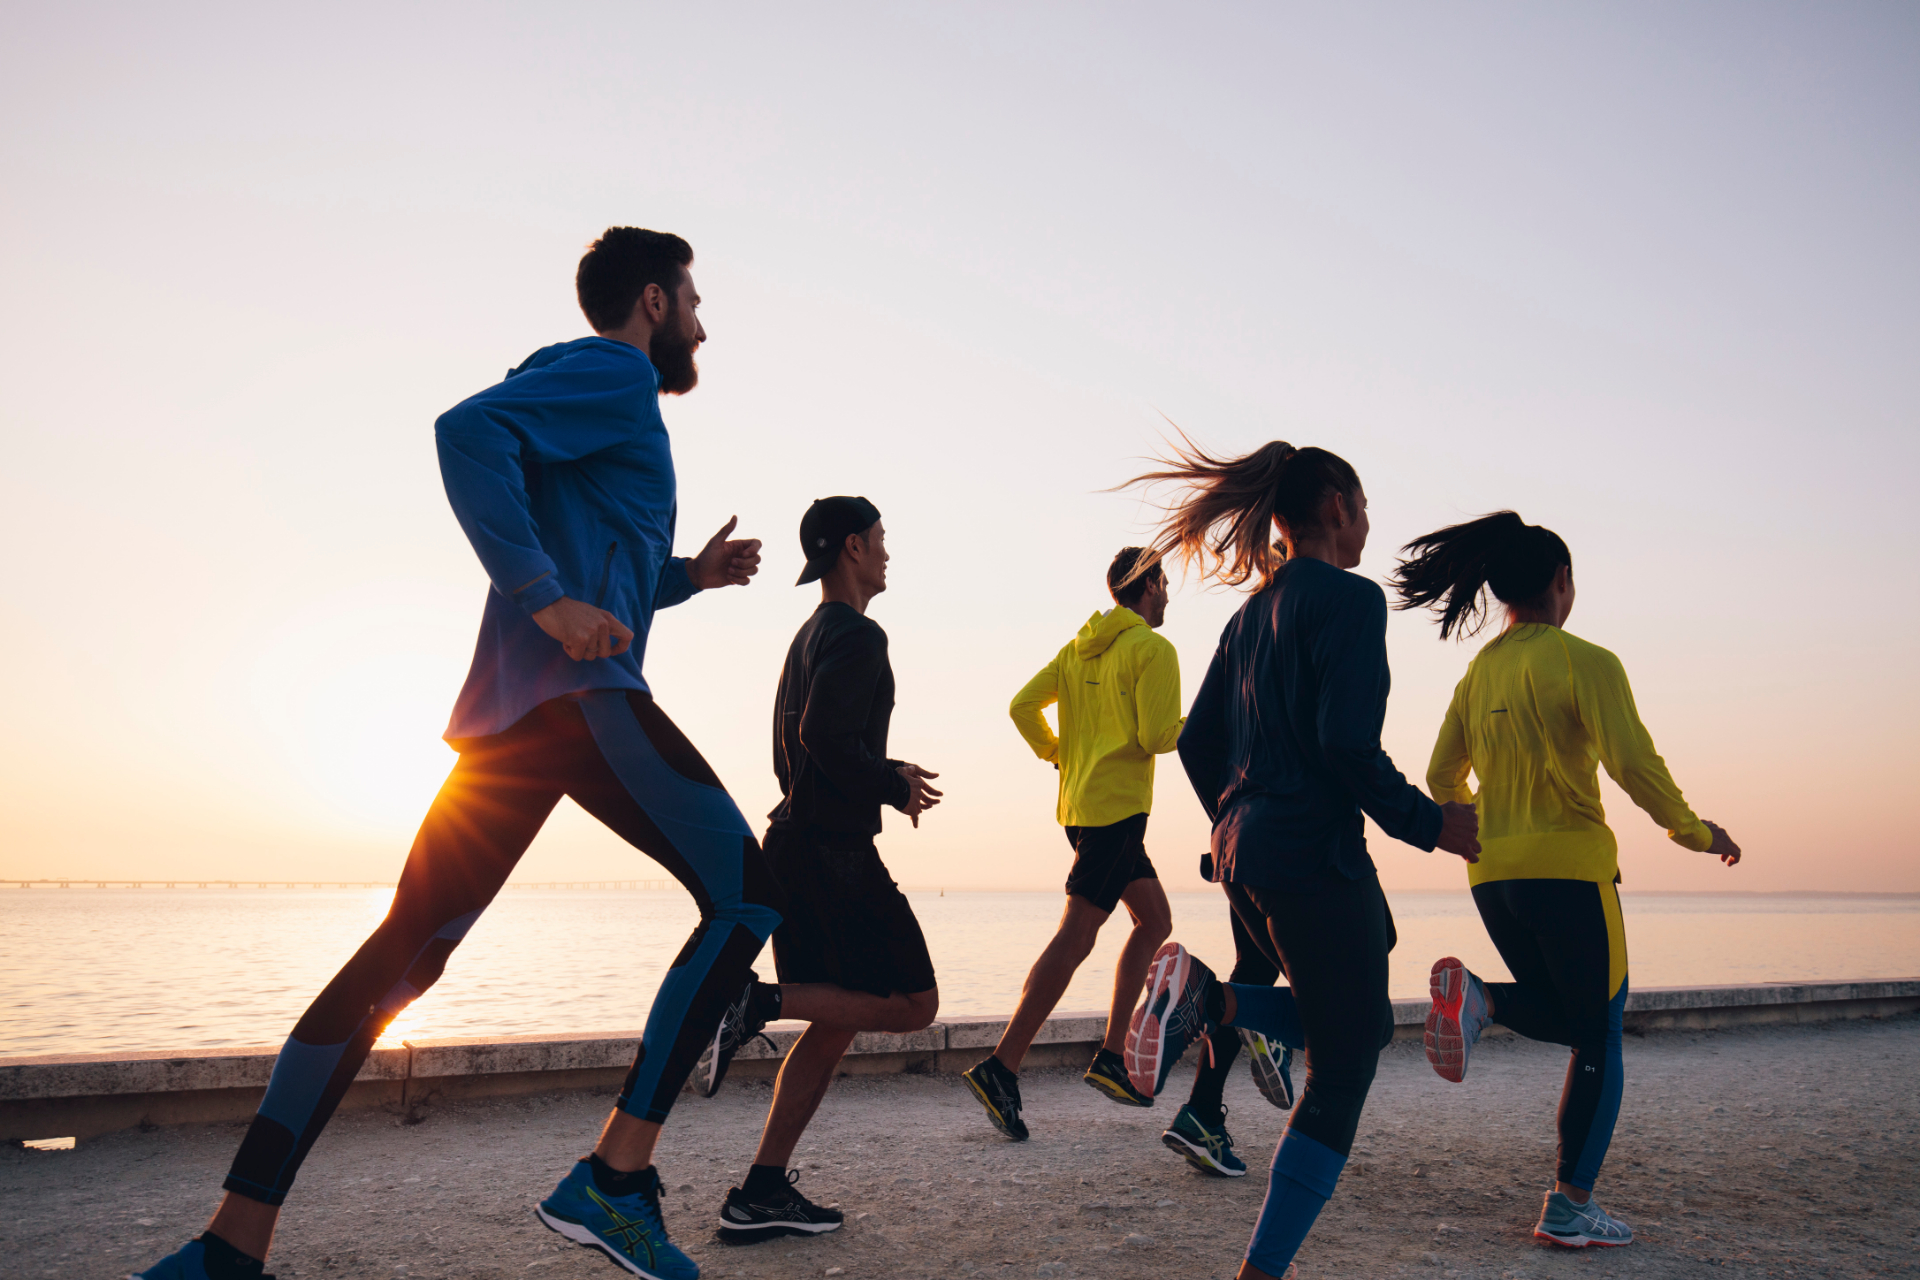 ASICS: creating quality lifestyle through intelligent sports